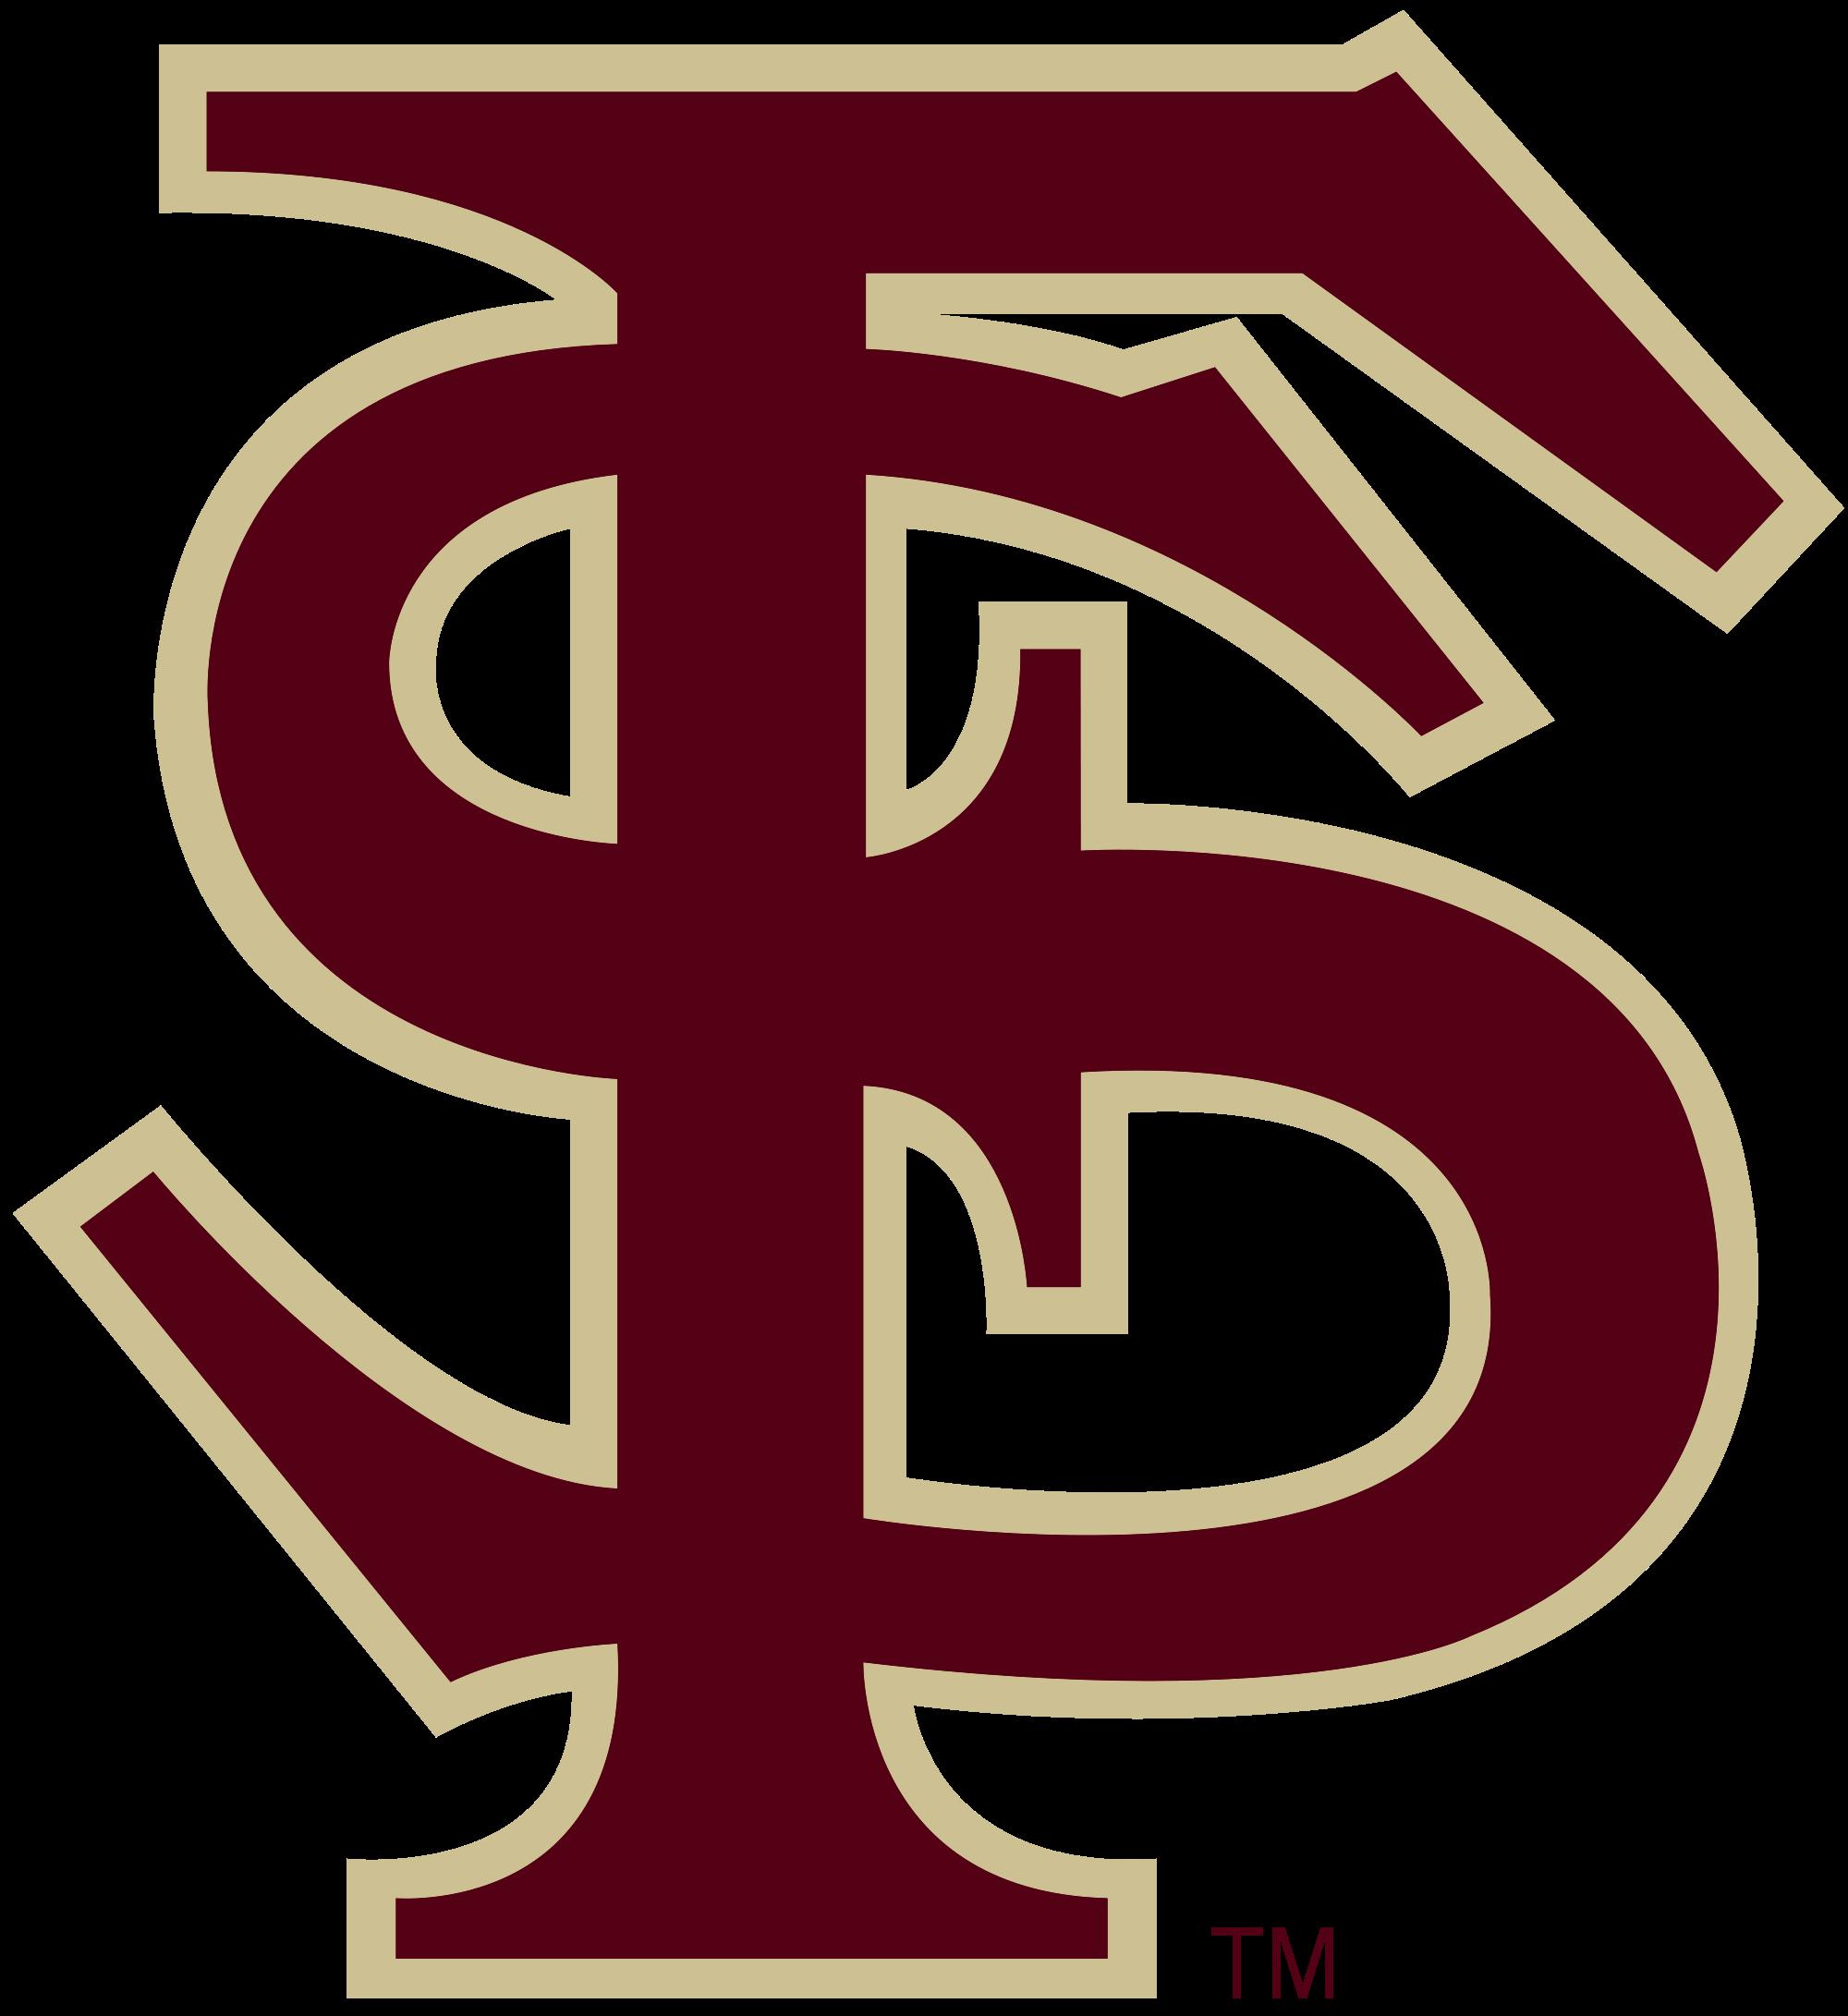 Florida state university baseball logo florida state university baseball logo buycottarizona Gallery